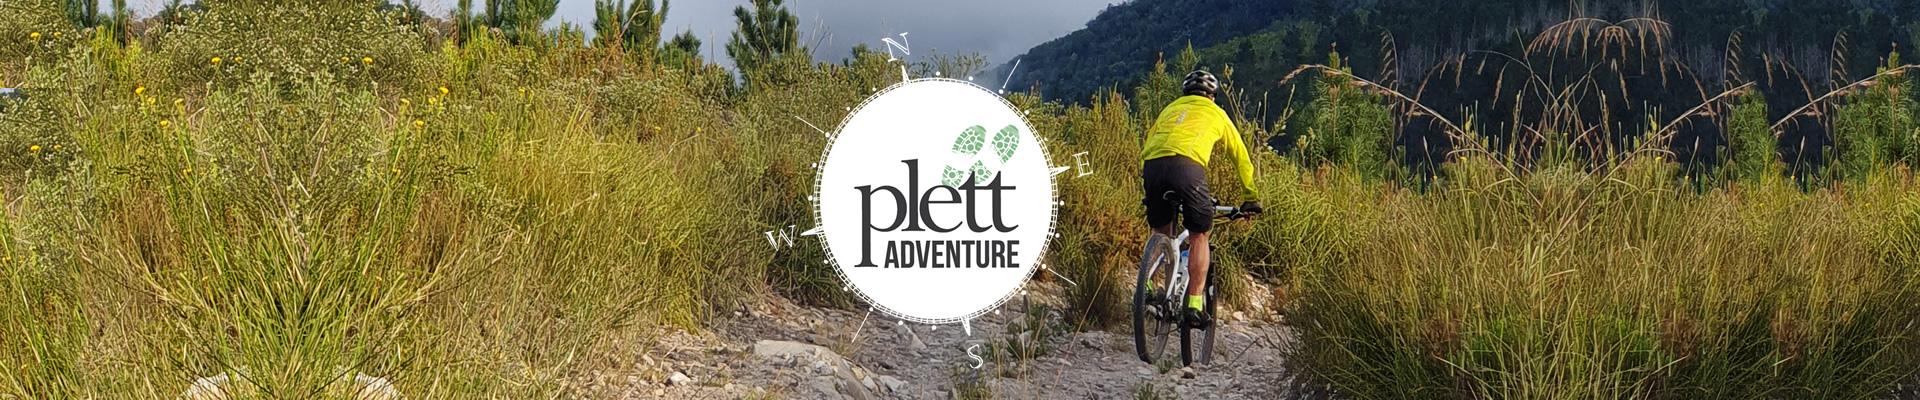 Plett Adventure 2020